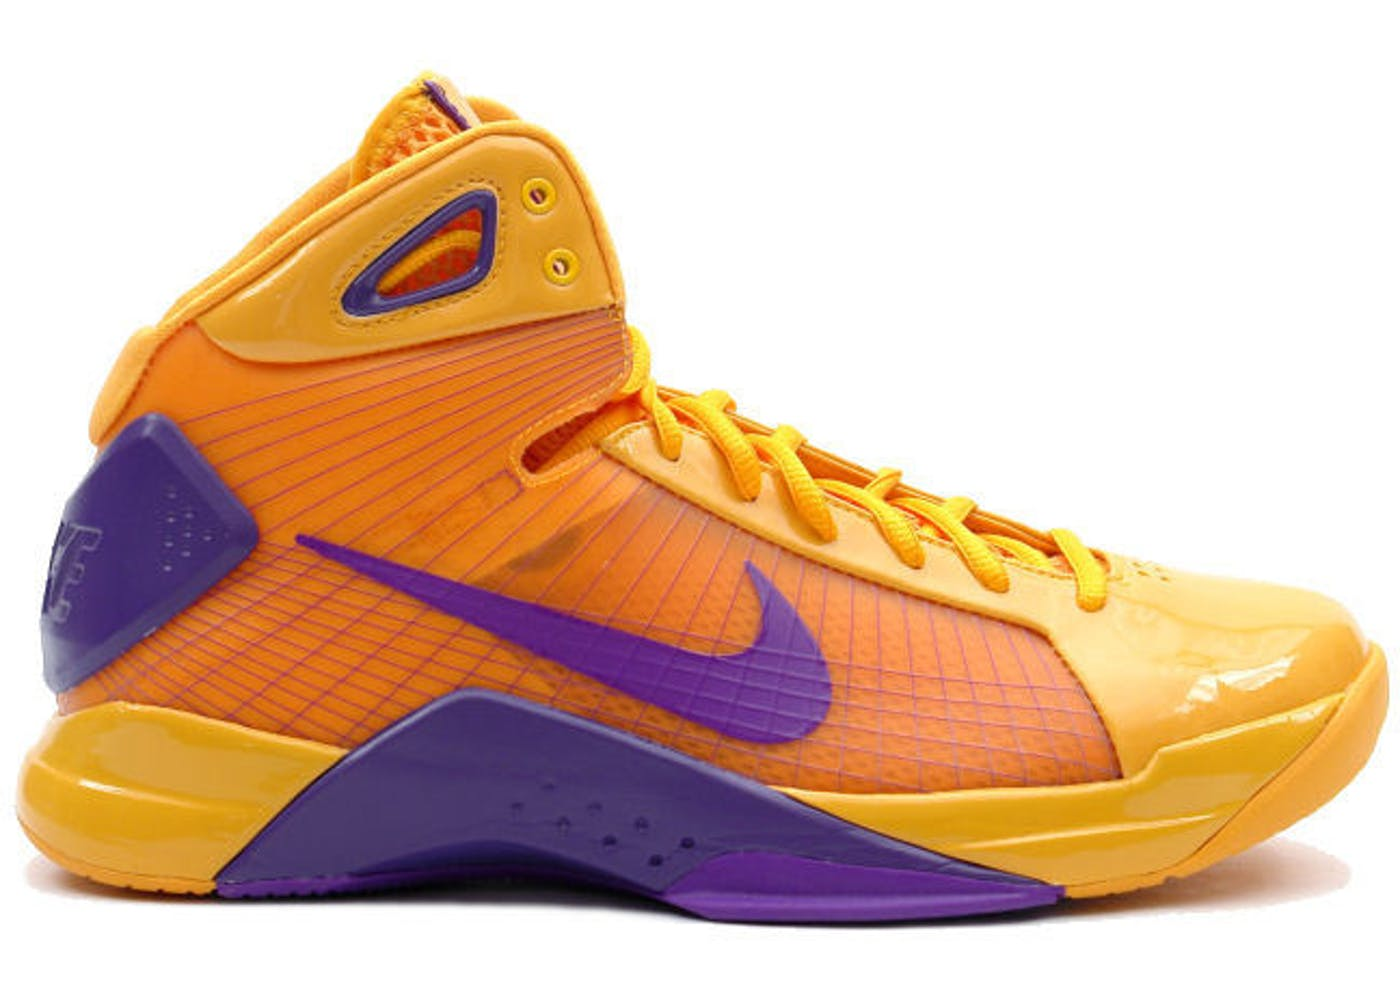 new arrival 164cf b1a10 ... Nike Hyperdunk 08 Kobe Bryant Snakepool